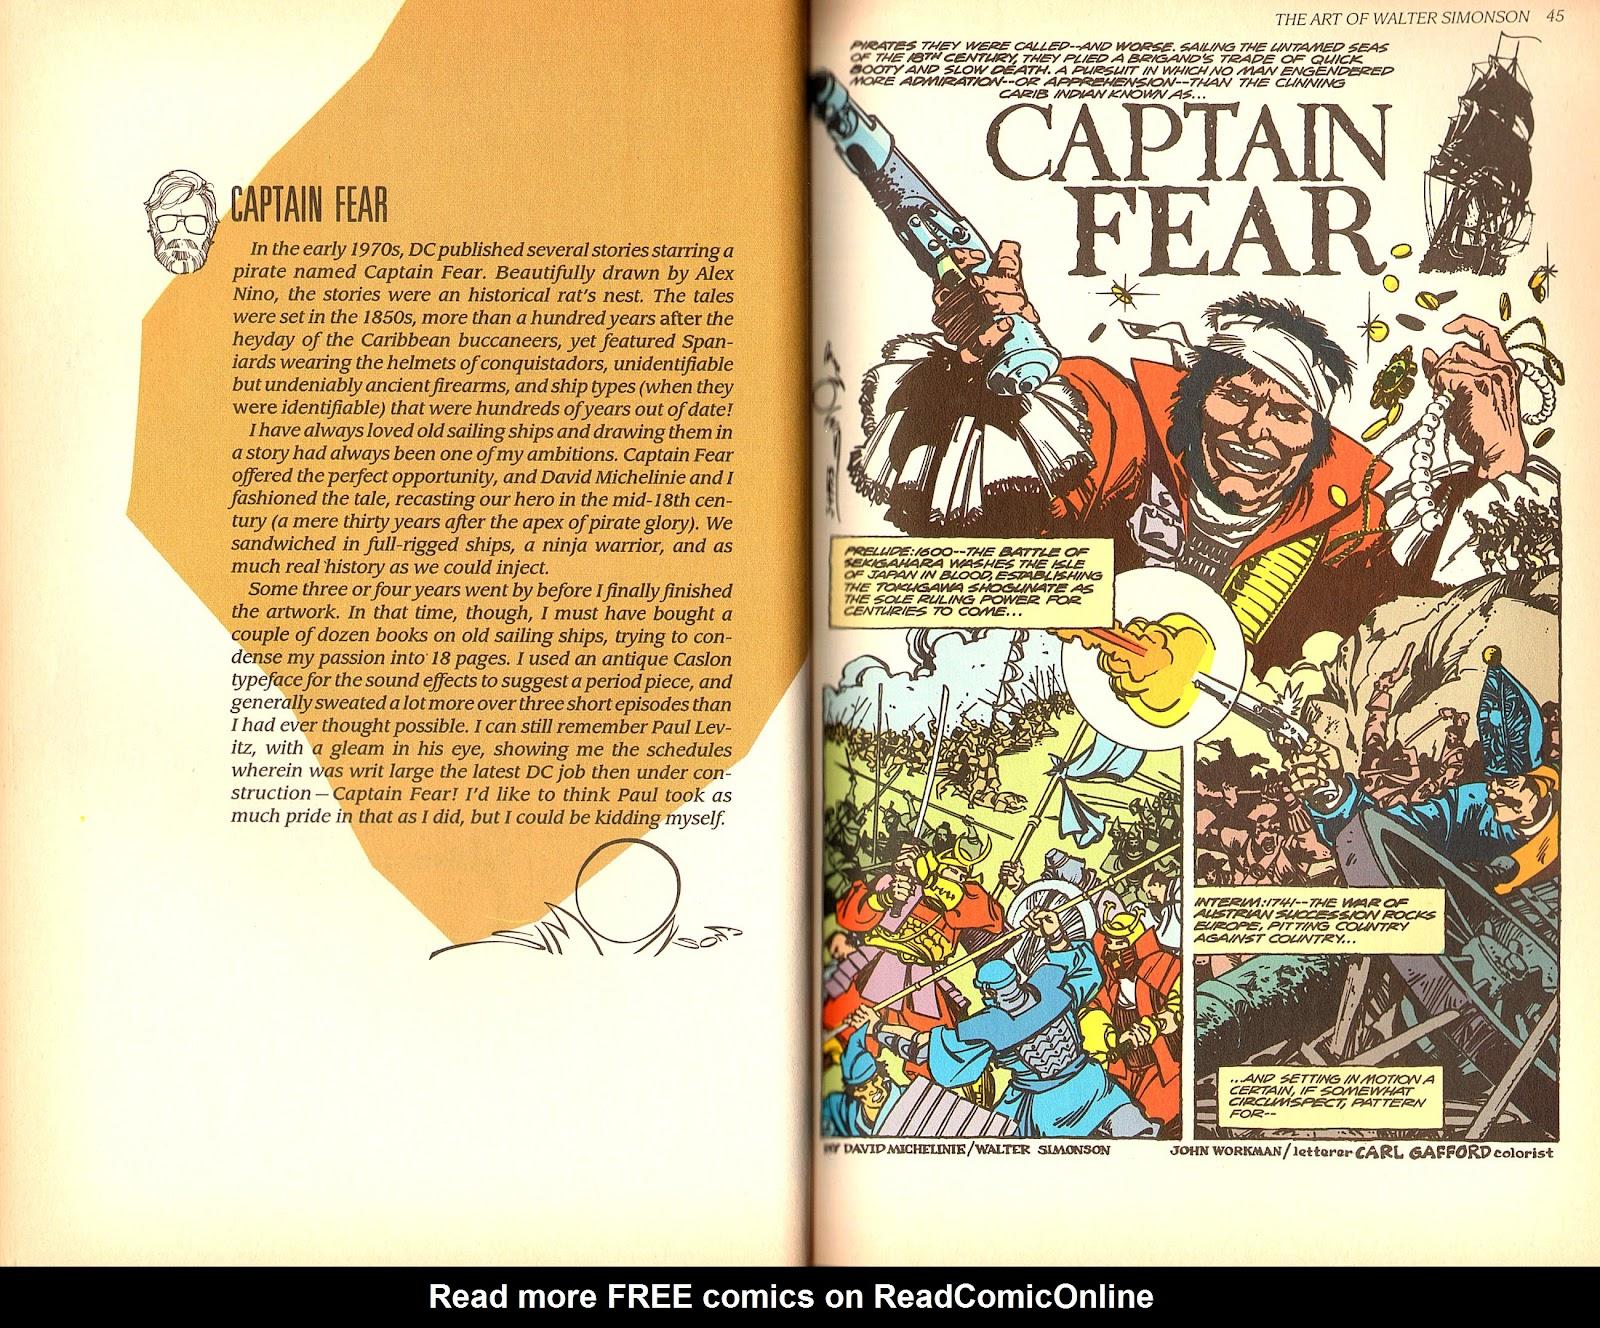 Read online The Art of Walter Simonson comic -  Issue # TPB - 24